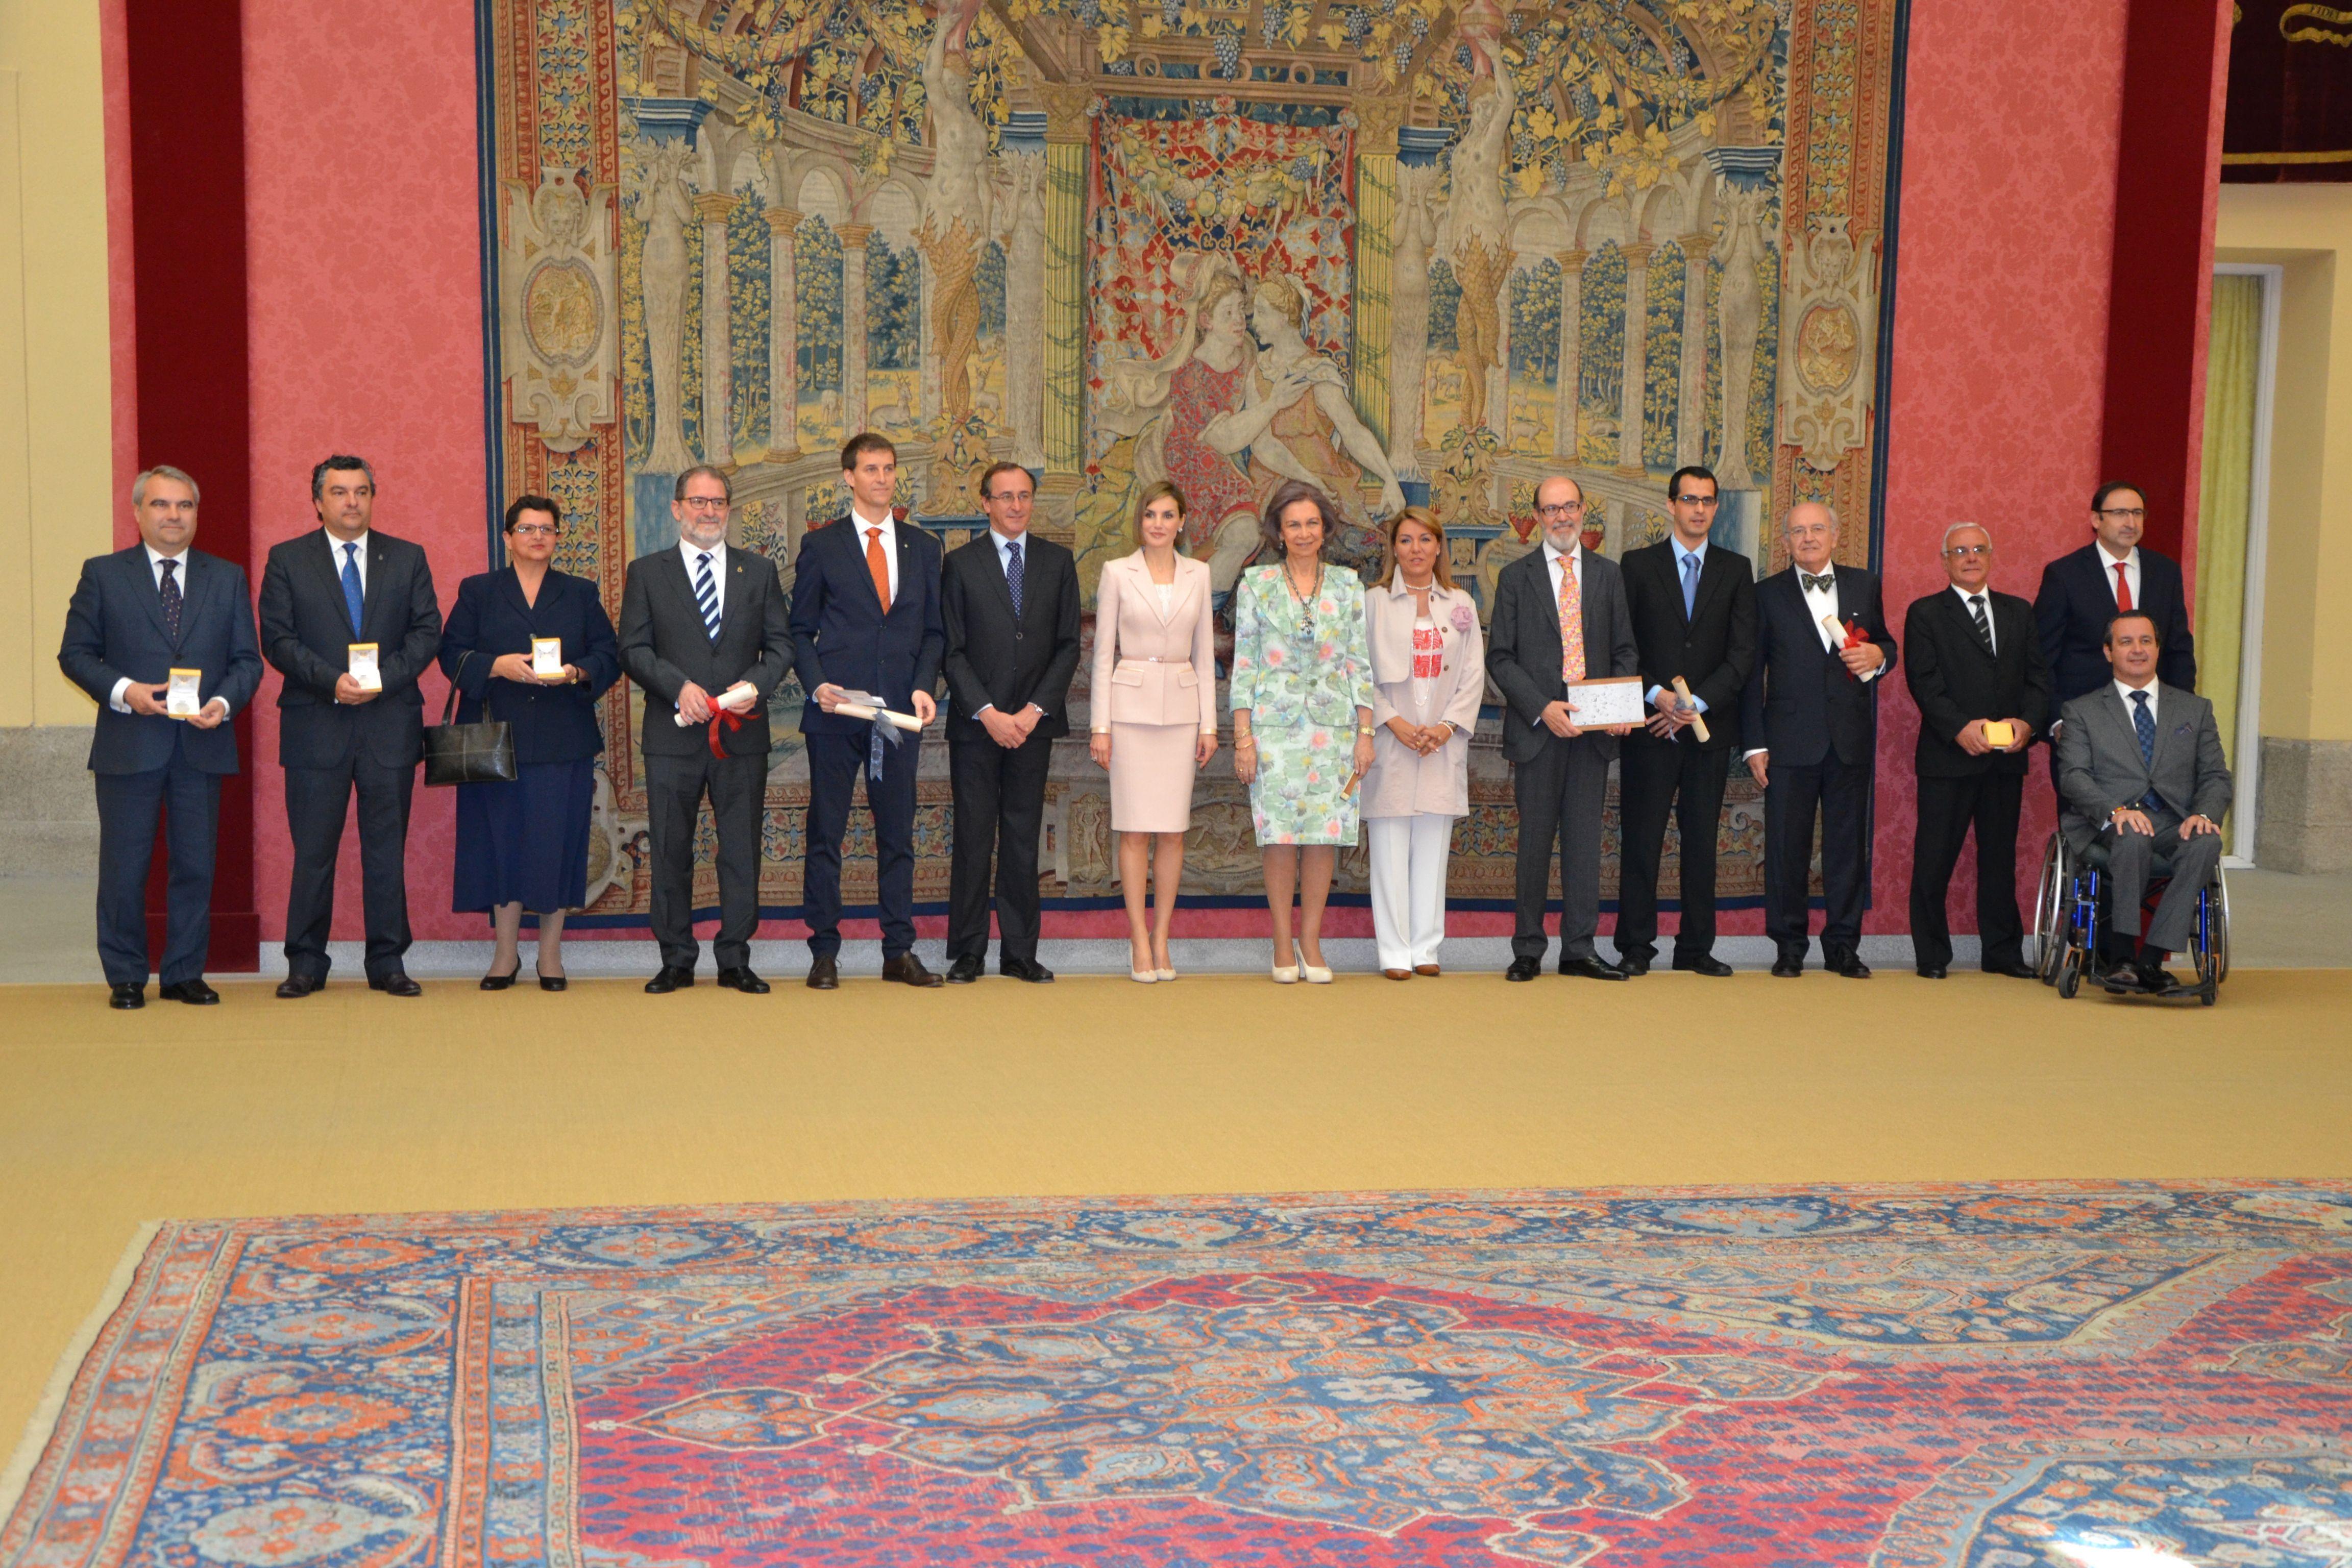 Premios Reina Sofia 2015